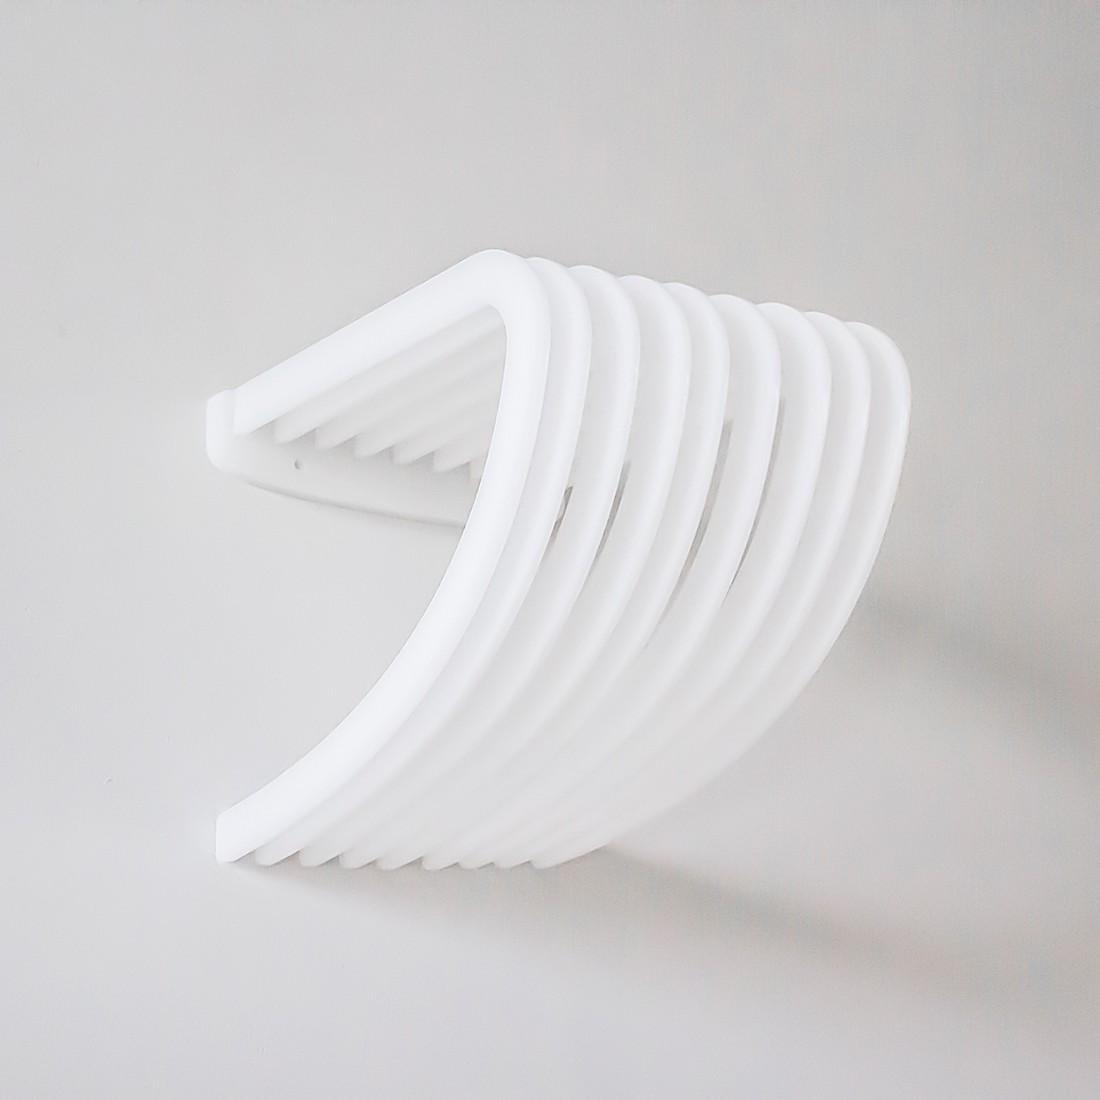 Wandregal Shell I – Weiß, Metrocuadro Design günstig online kaufen